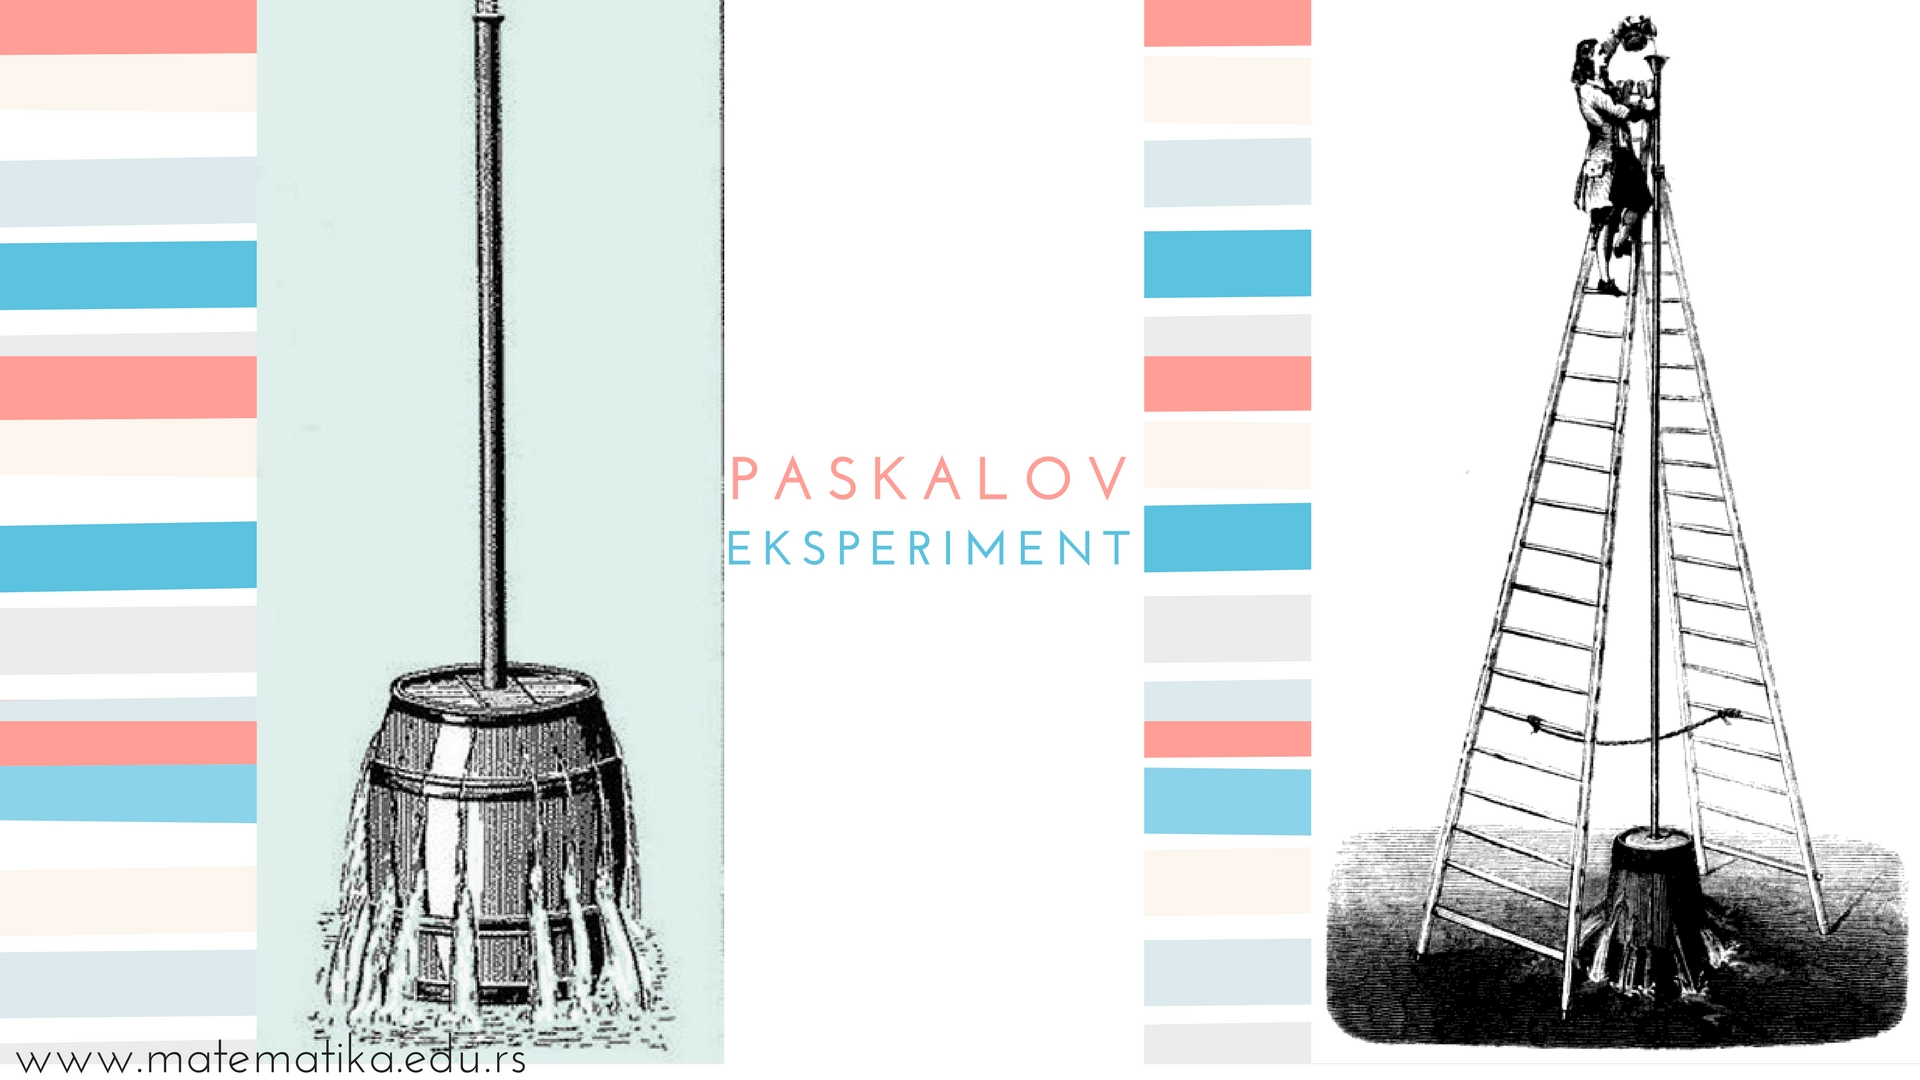 paskalov eksperiment